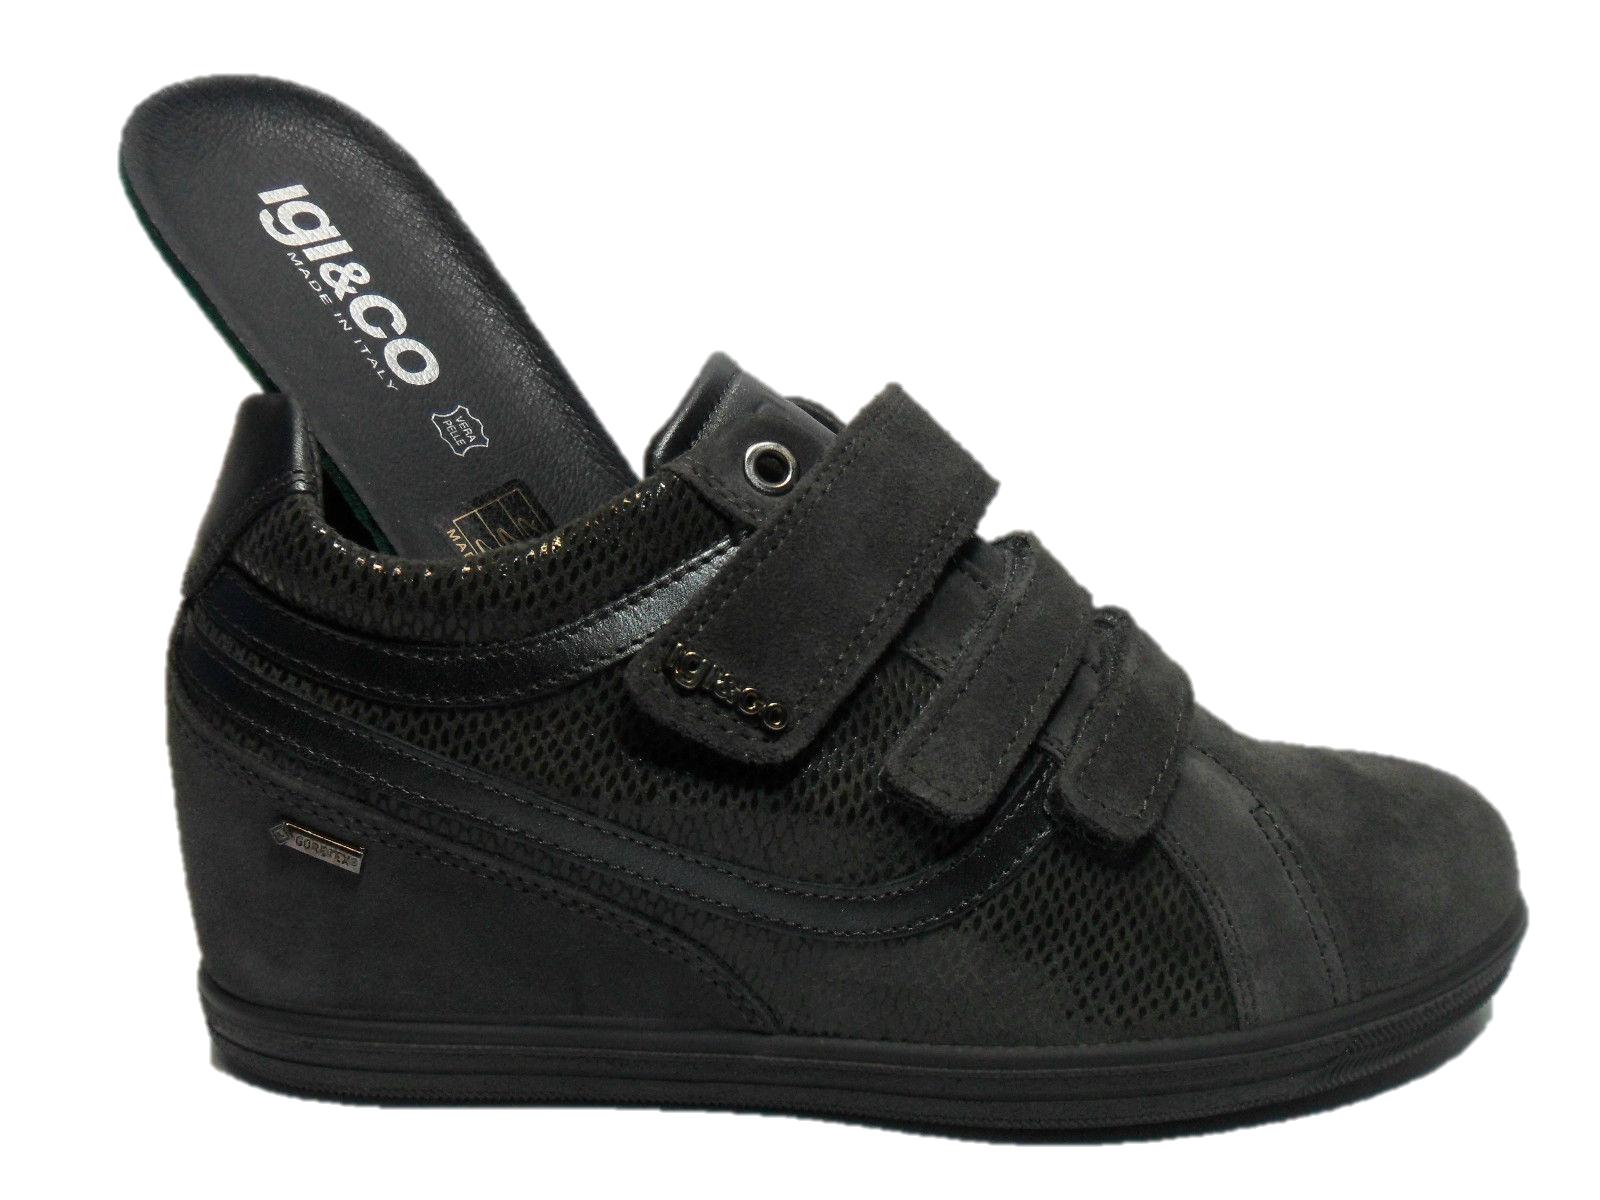 IGI & CO zapatos MODELLO mujer MODELLO zapatos zapatilla de deporte gris ZEPPA FODERA GORETEX - 48072 9f0b7e